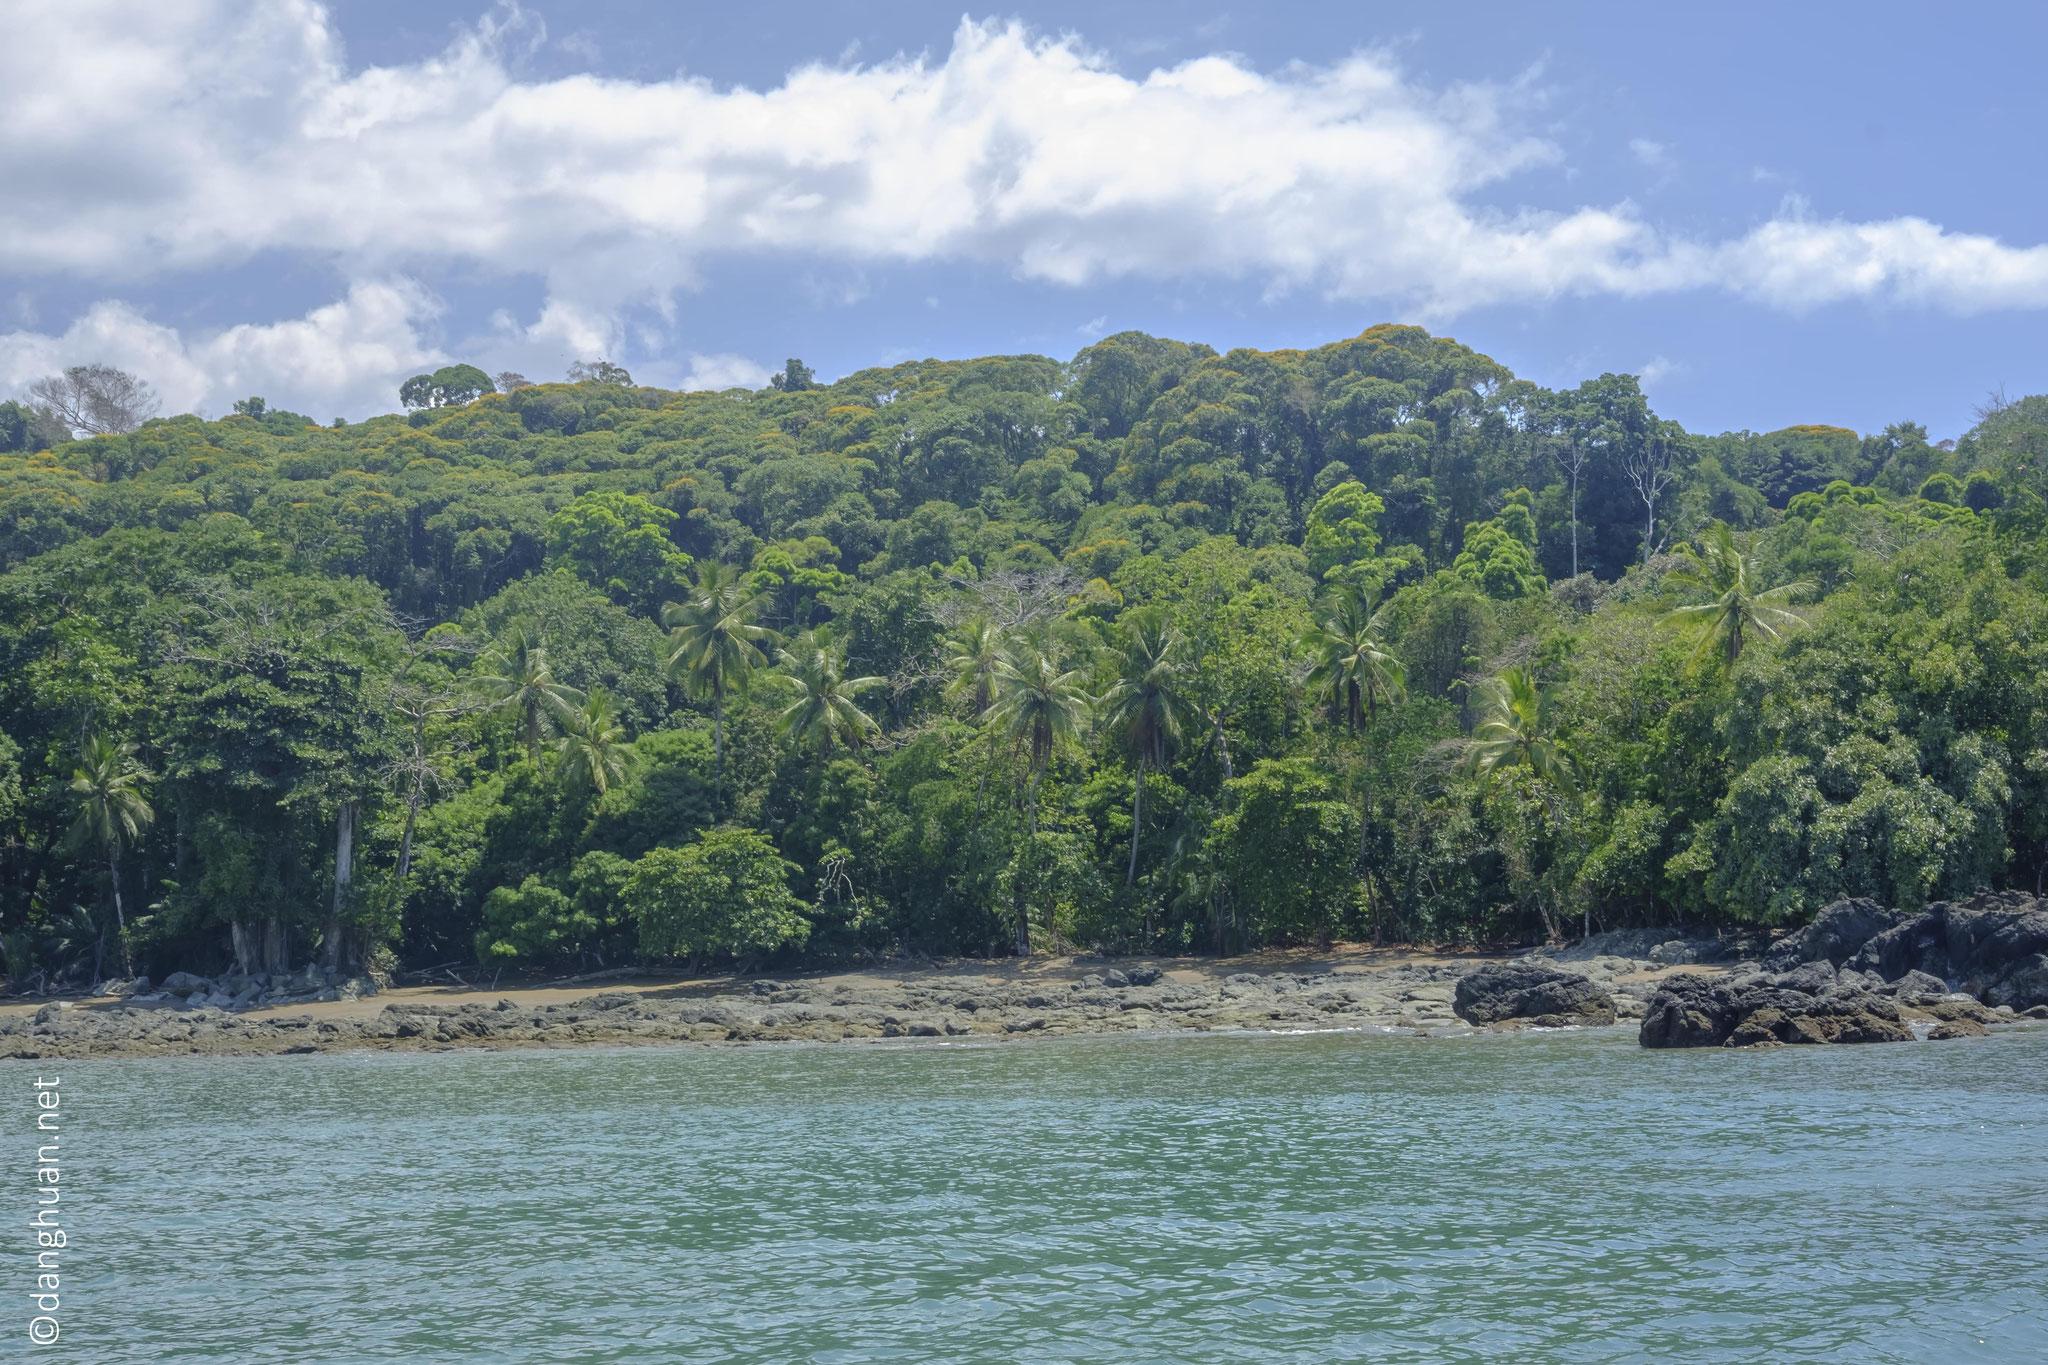 Les forêts humides tropicales qui composent la péninsule d'Osa ...